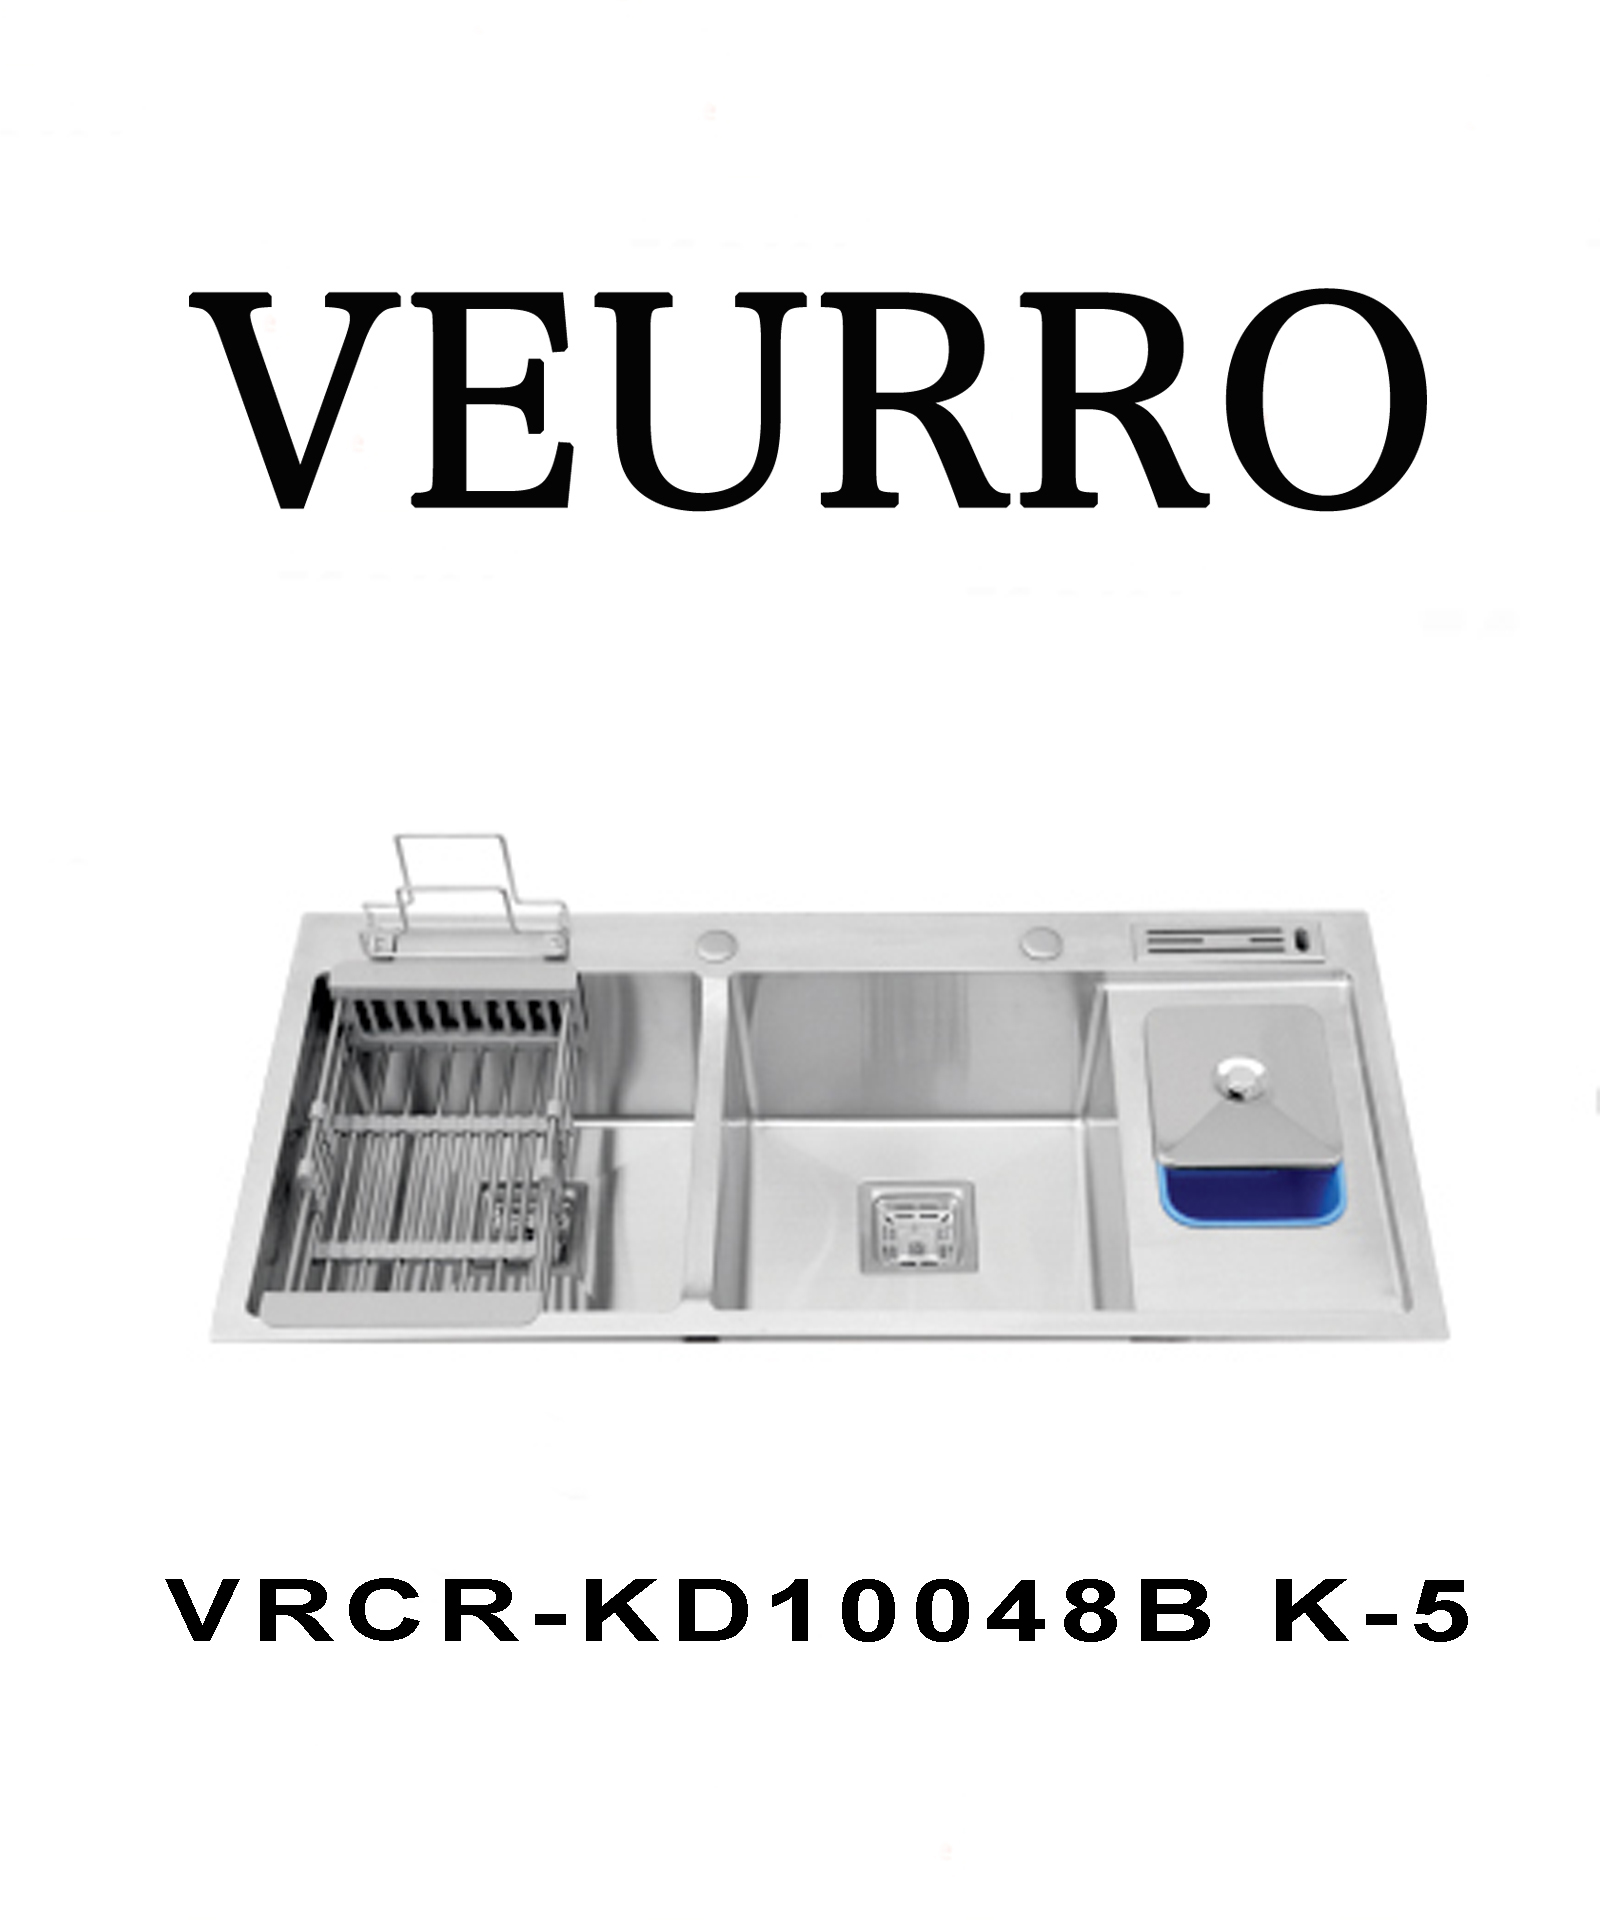 Chậu Rửa Chén Inox 304 Veurro VRCR-KD10048 K-5